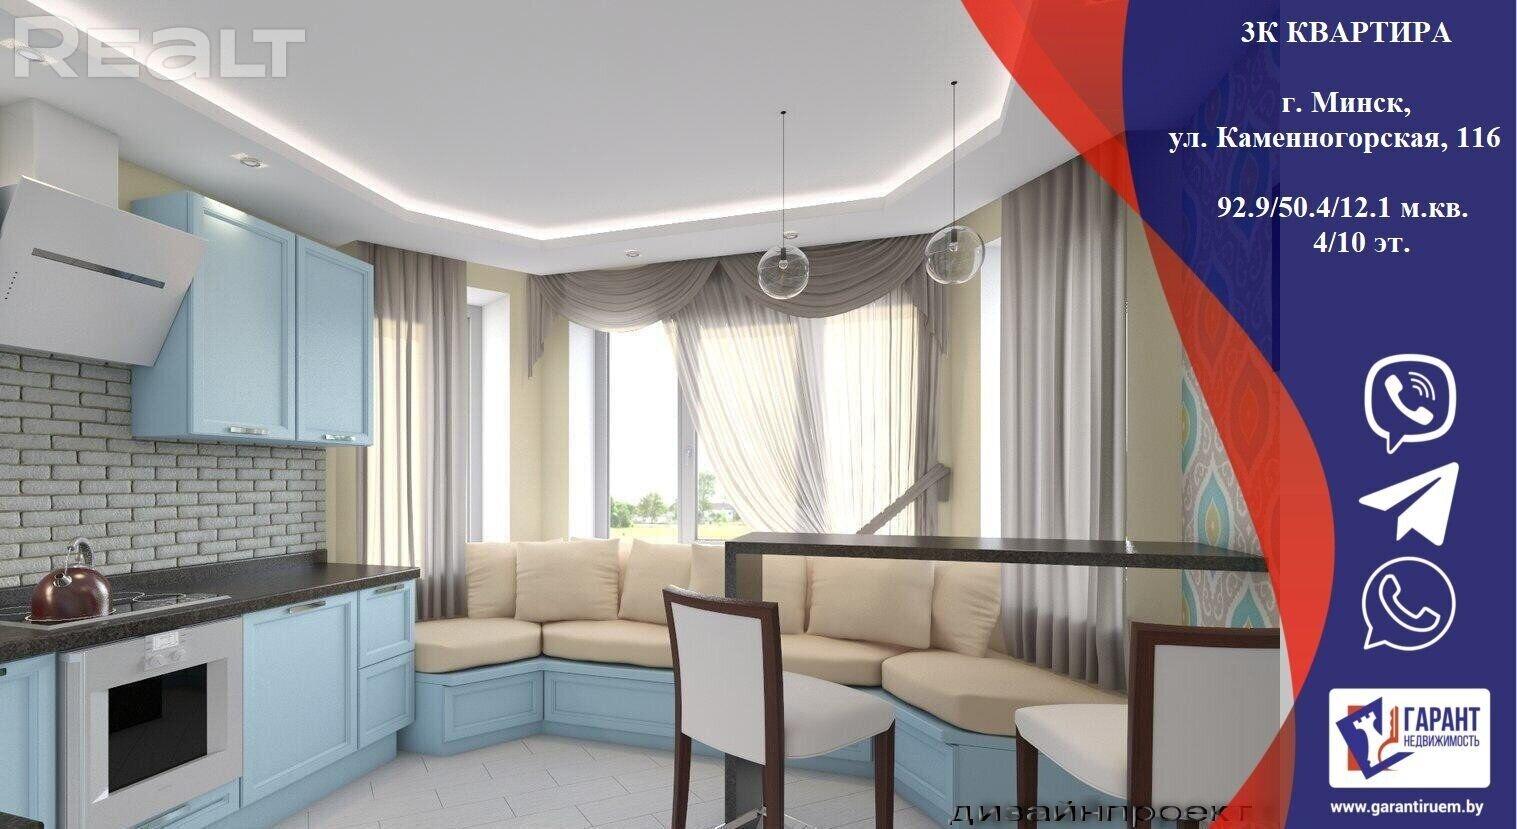 3-комнатная квартира по ул. Каменногорская, 116.